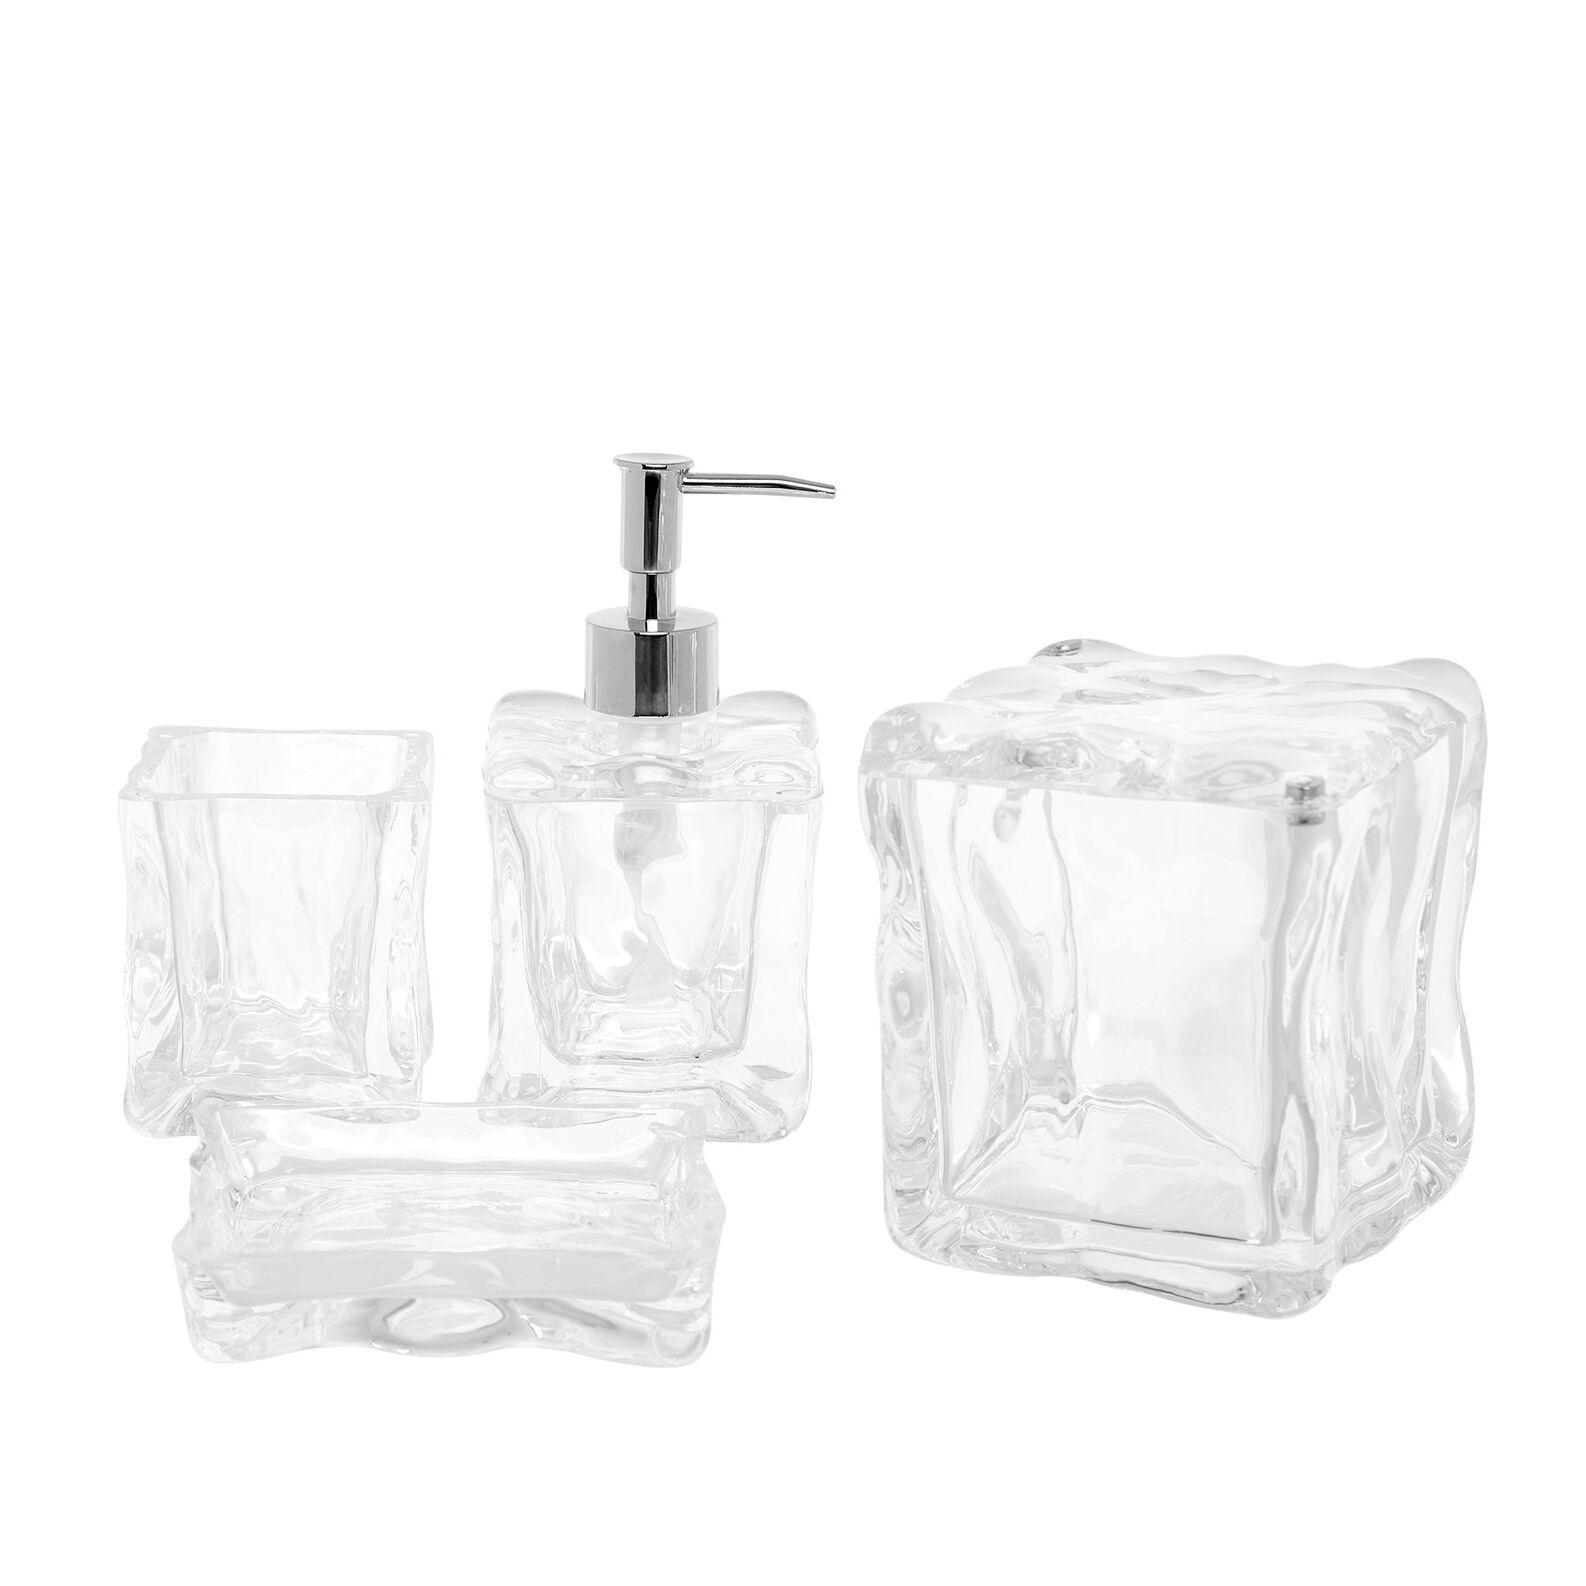 Ice-effect plastic cotton-pad holder